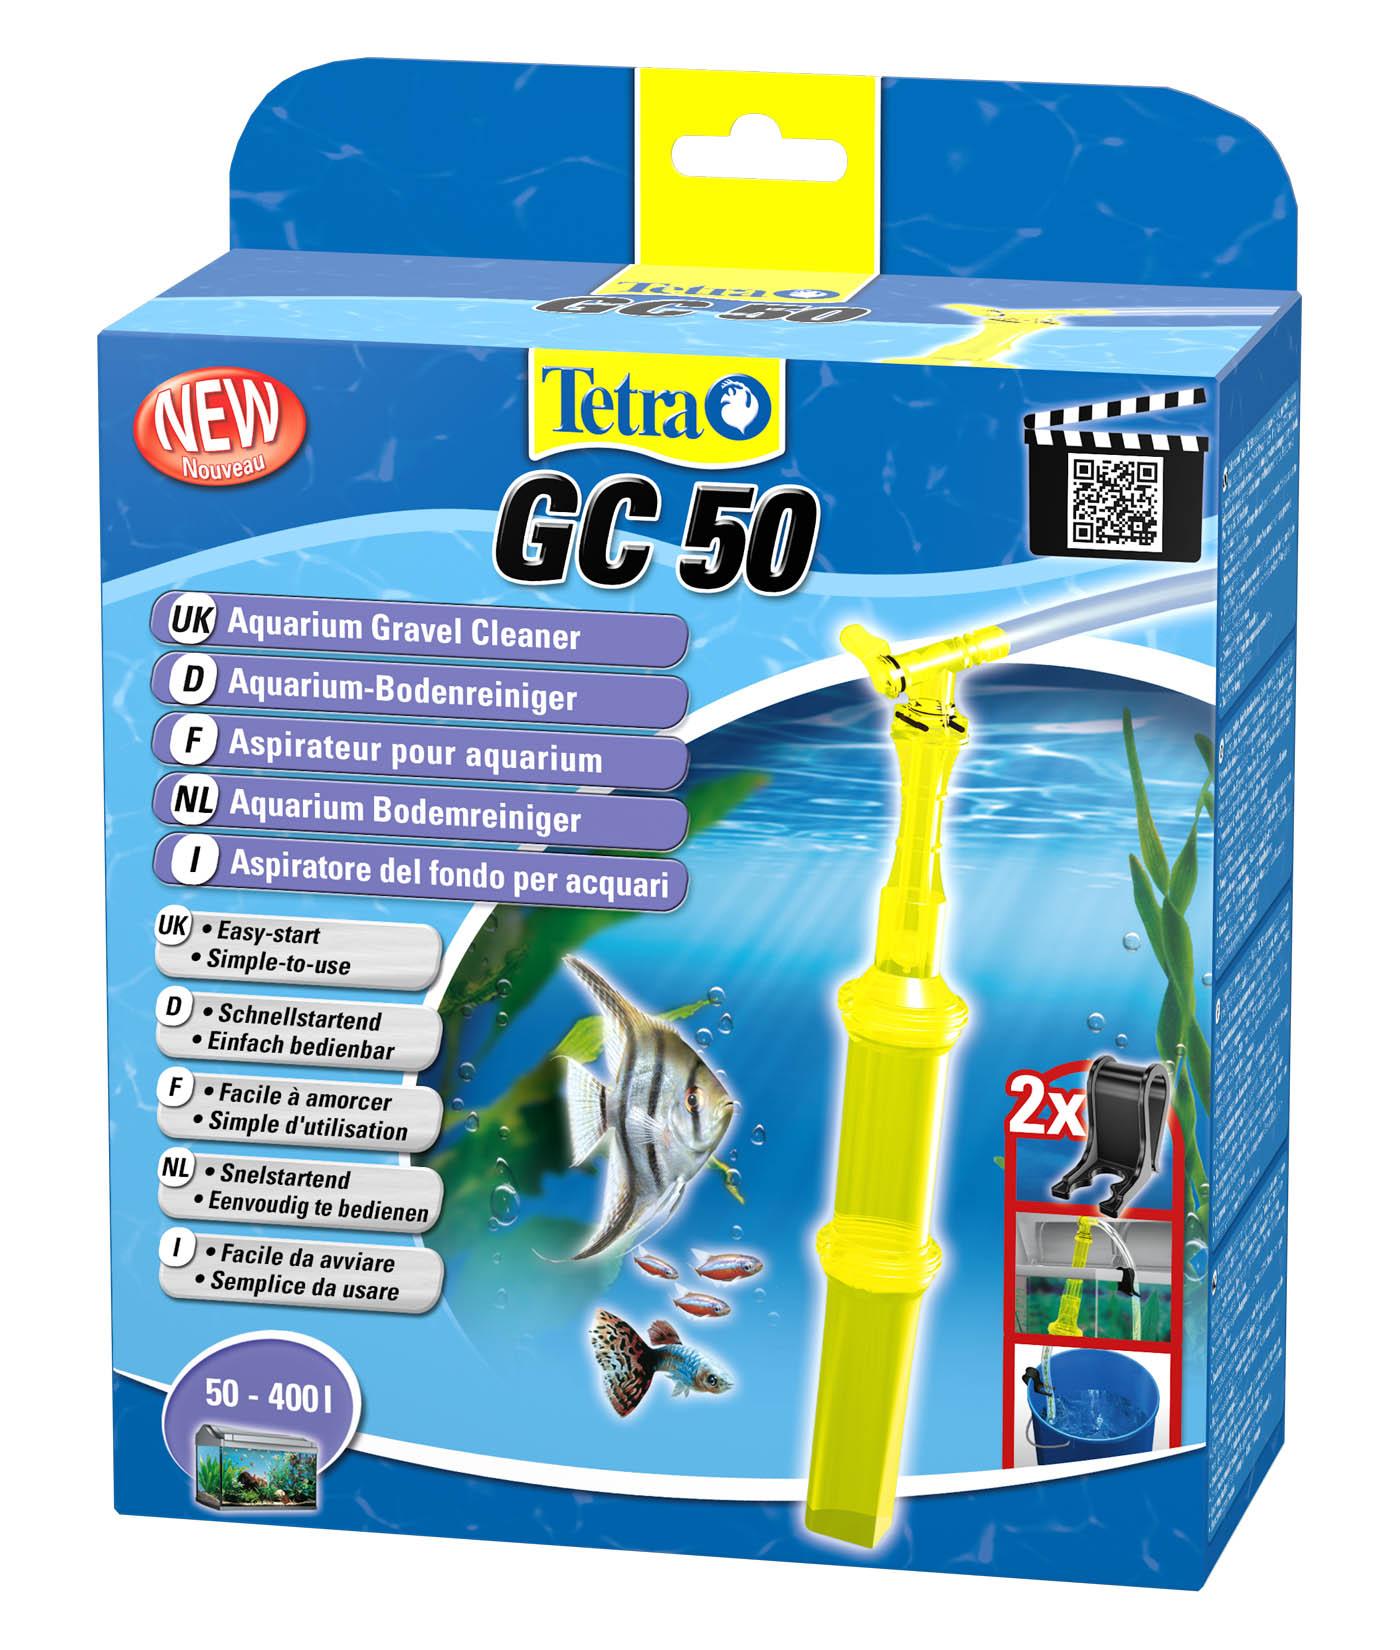 TETRA THICKENER s ventilom BP-50 pre akvárium 50-400L